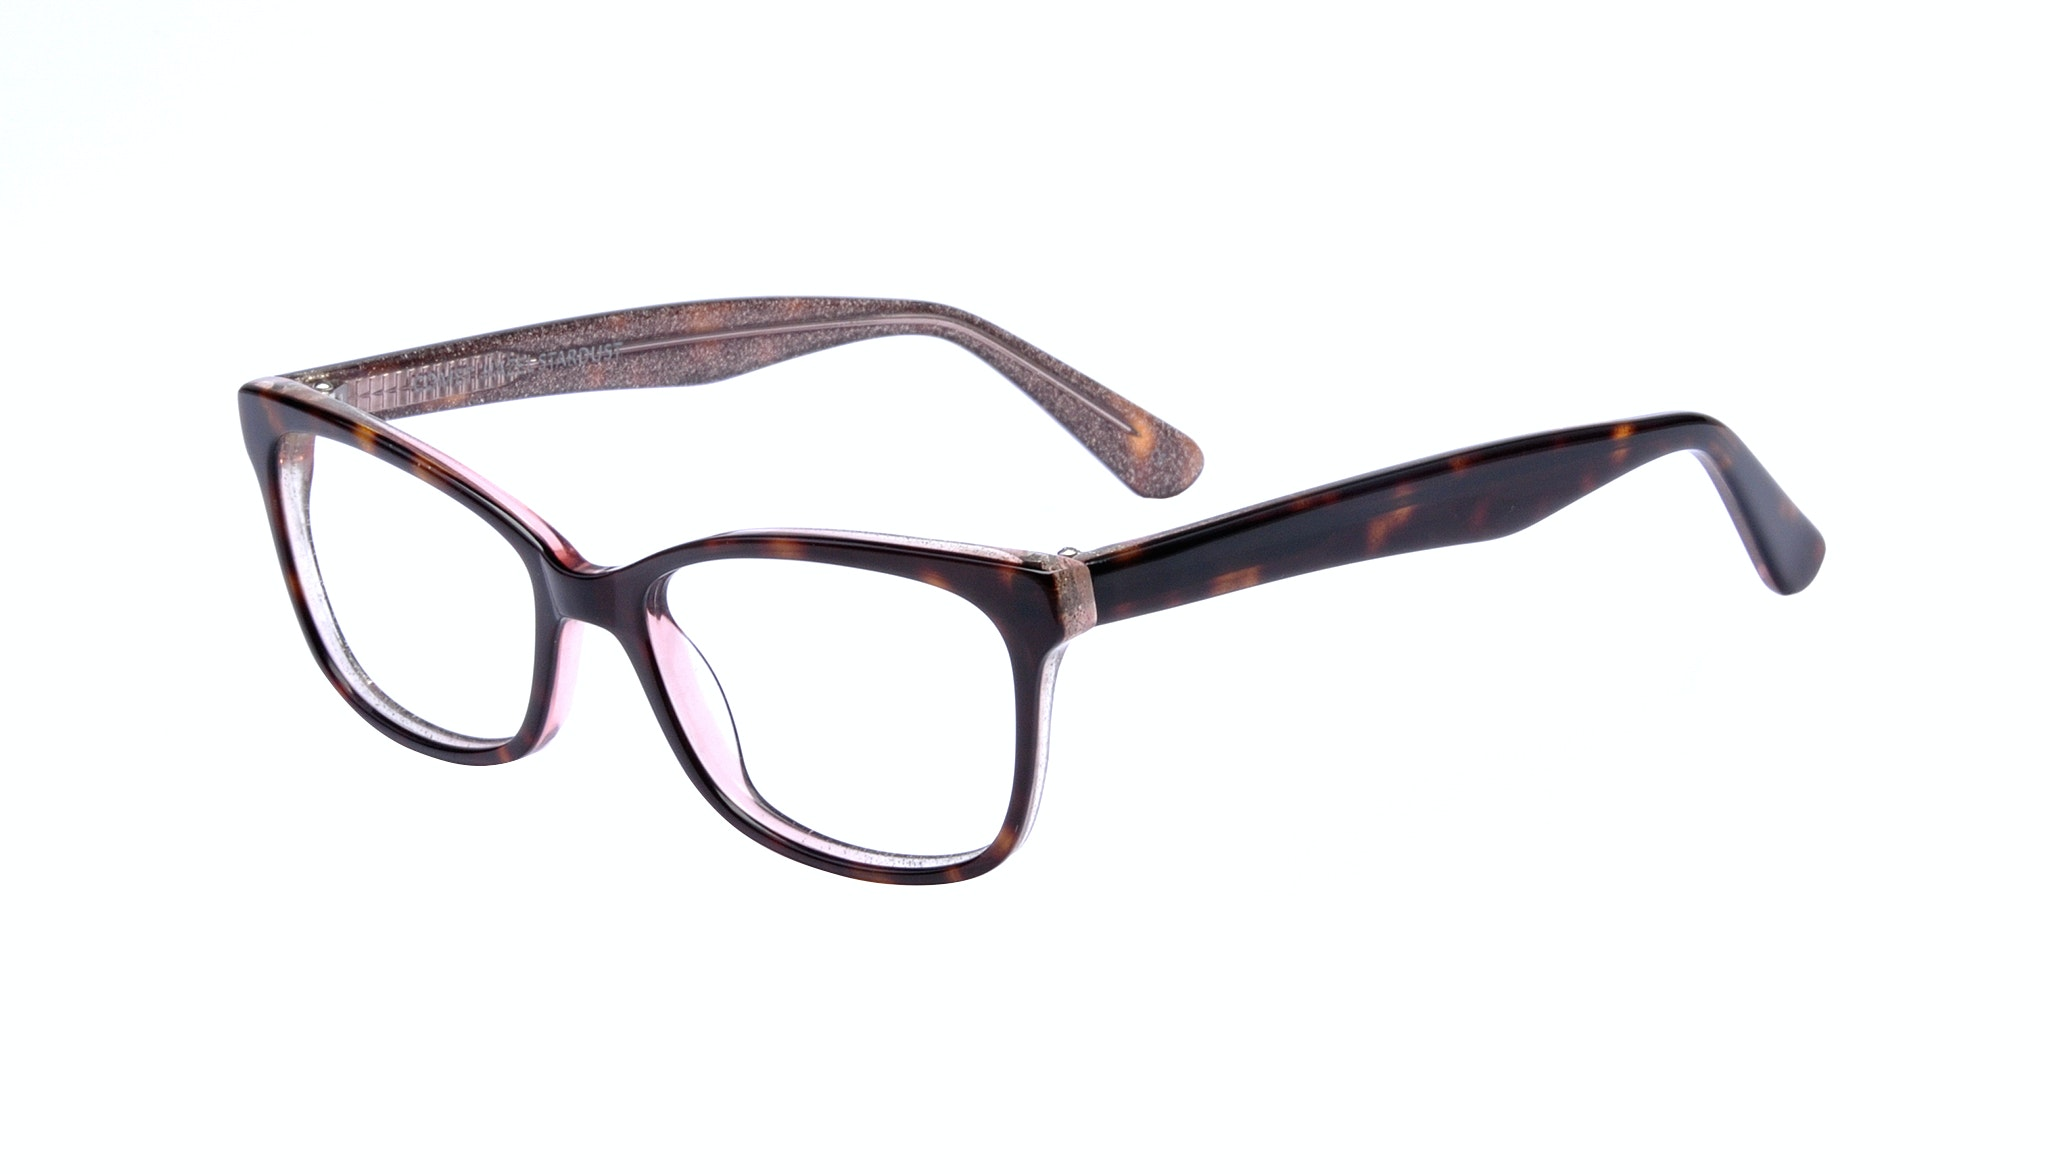 Affordable Fashion Glasses Cat Eye Rectangle Square Eyeglasses Women Comet Hazel Stardust Tilt